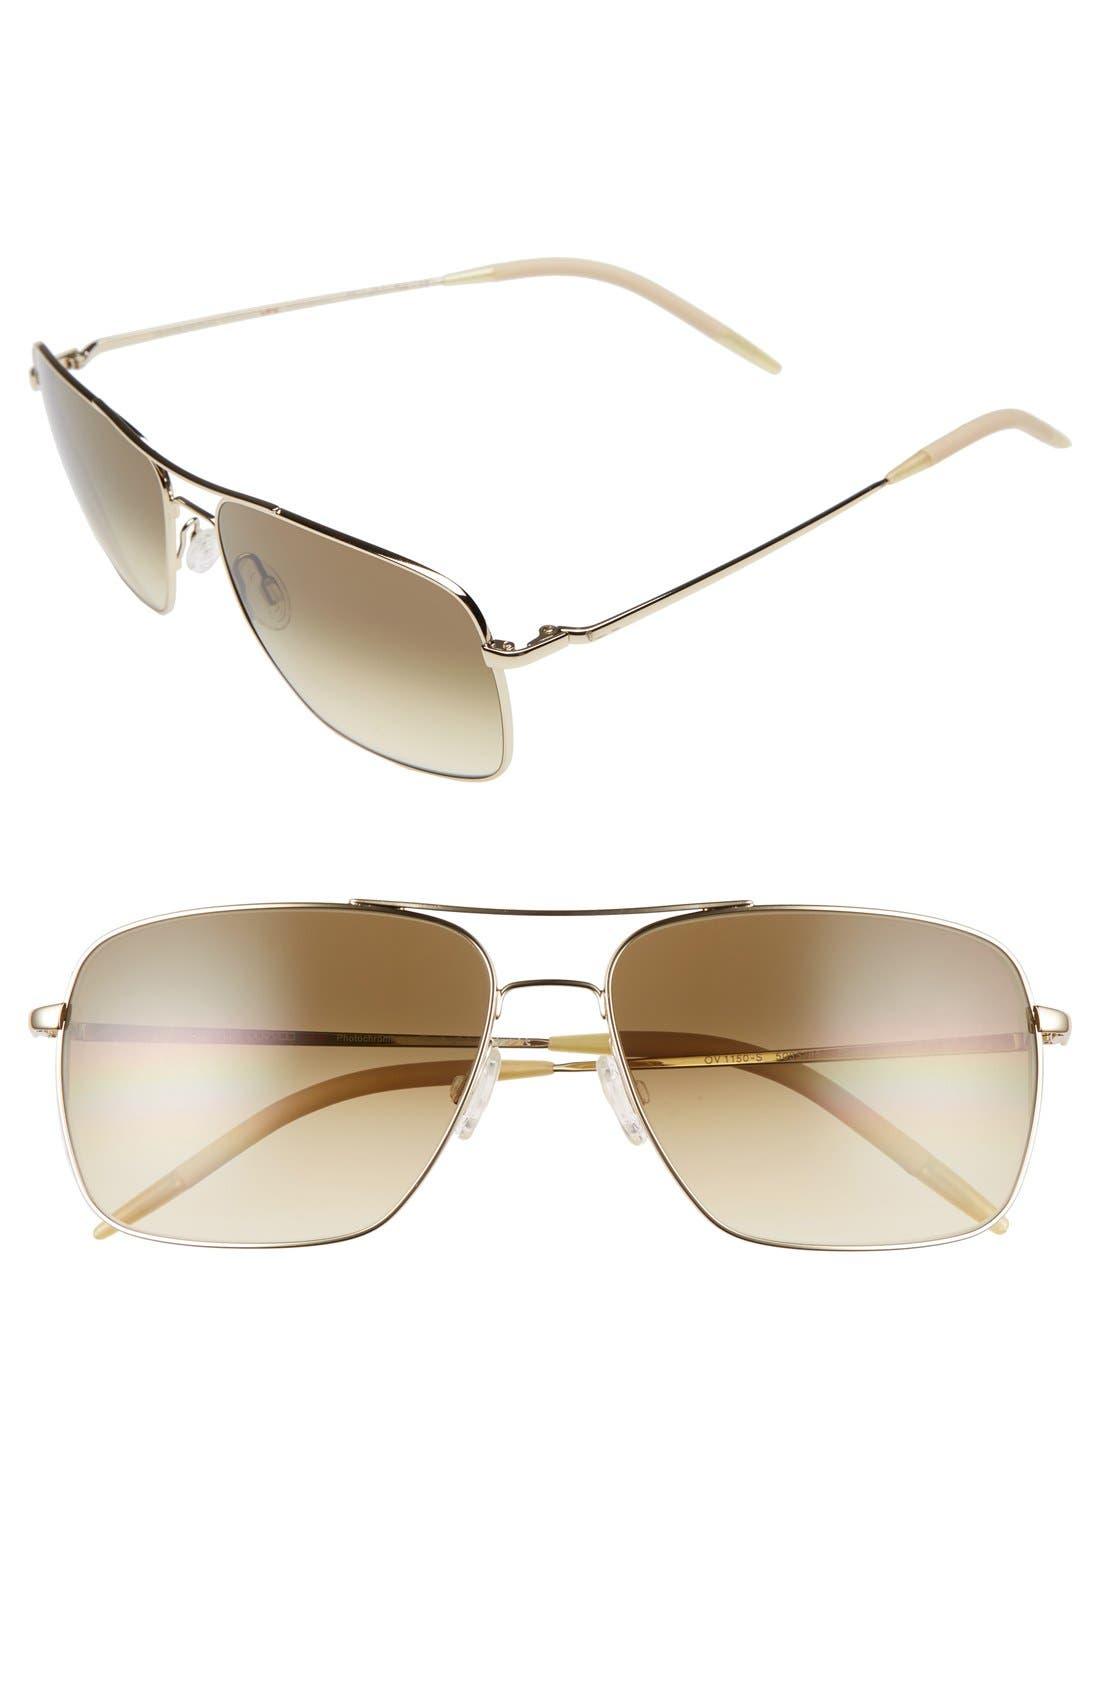 Clifton 58mm Aviator Sunglasses,                         Main,                         color, GOLD